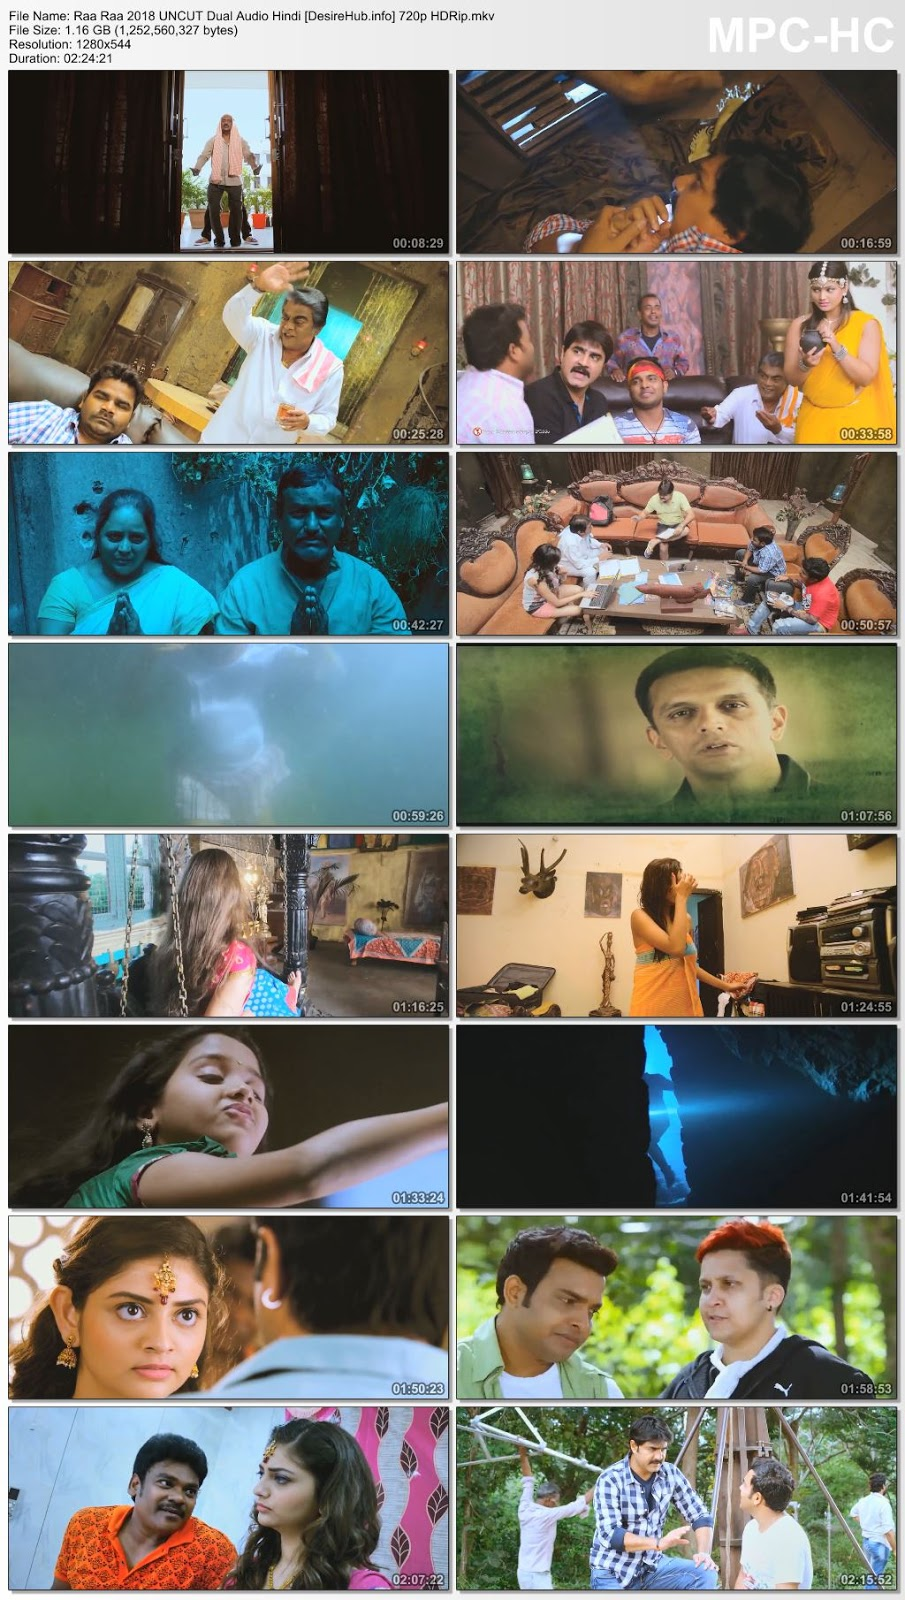 Raa Raa 2018 UNCUT Dual Audio Hindi 720p HDRip 1.1GB Desirehub